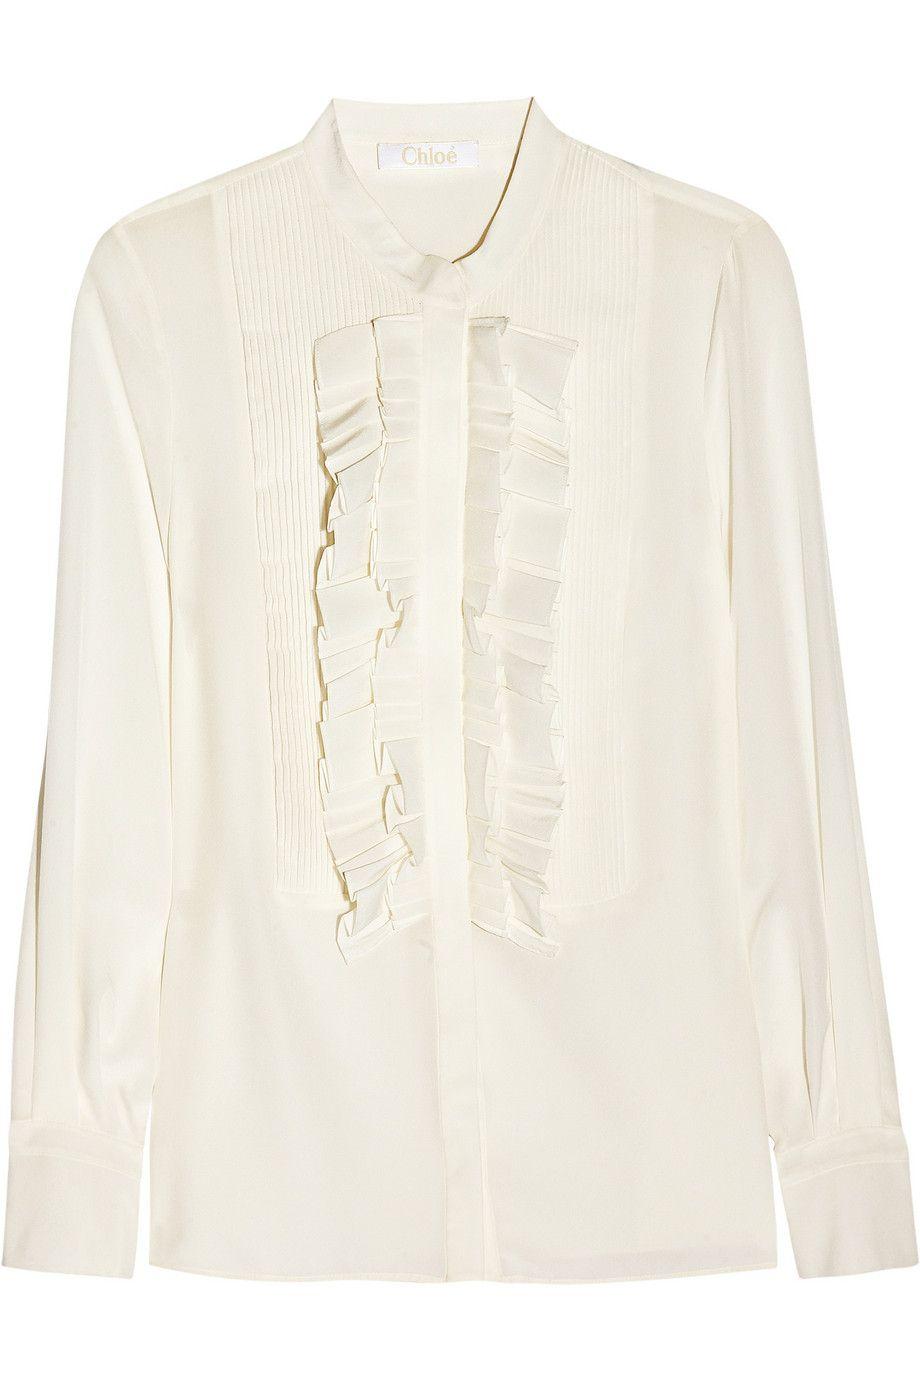 Chloé - Ruffled silk crepe de chine blouse